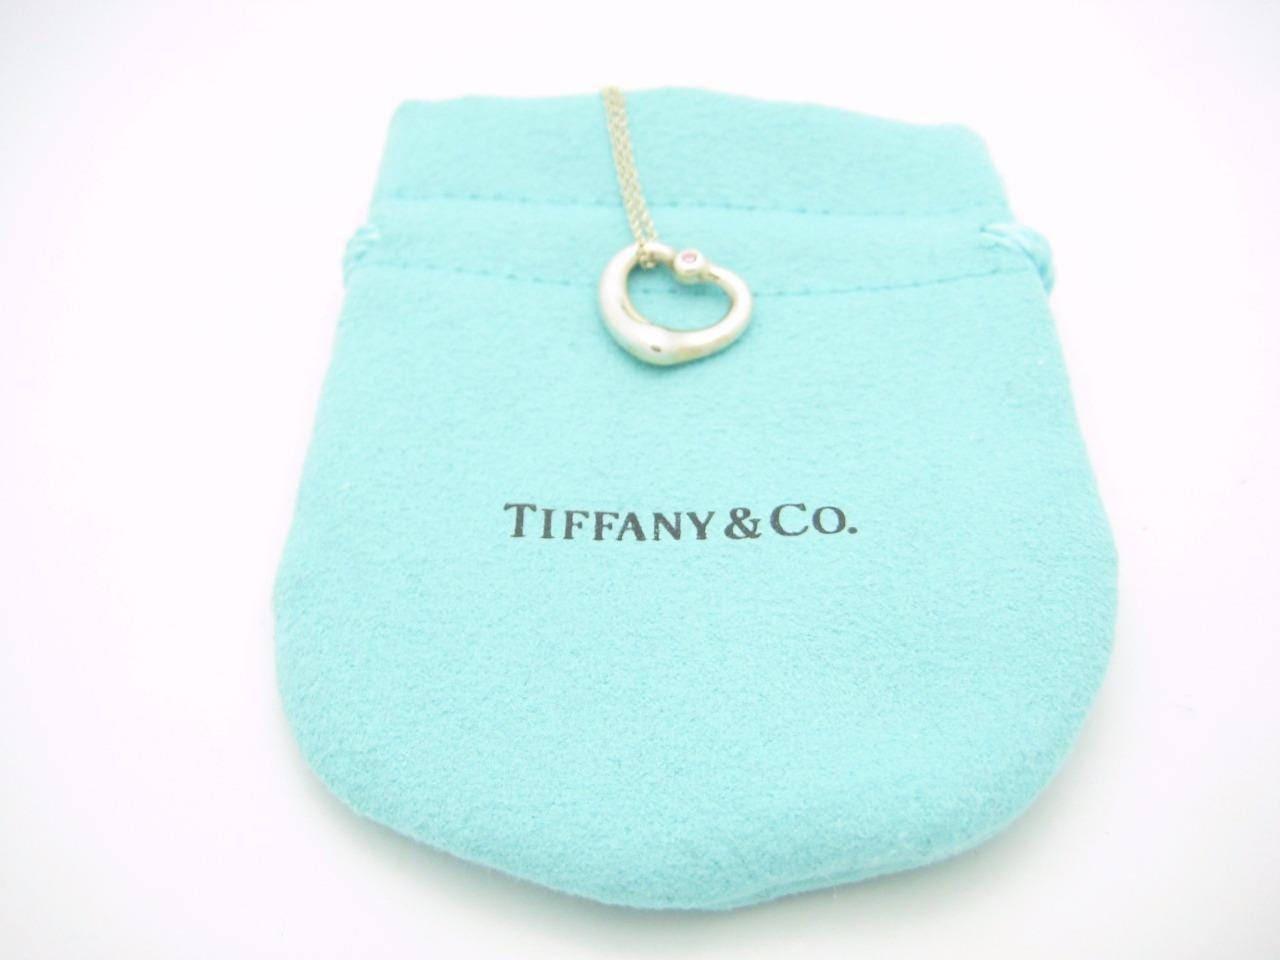 ff7a47a03 Tiffany & Co. Peretti Silver Small Open Heart Pink Sapphire | Etsy